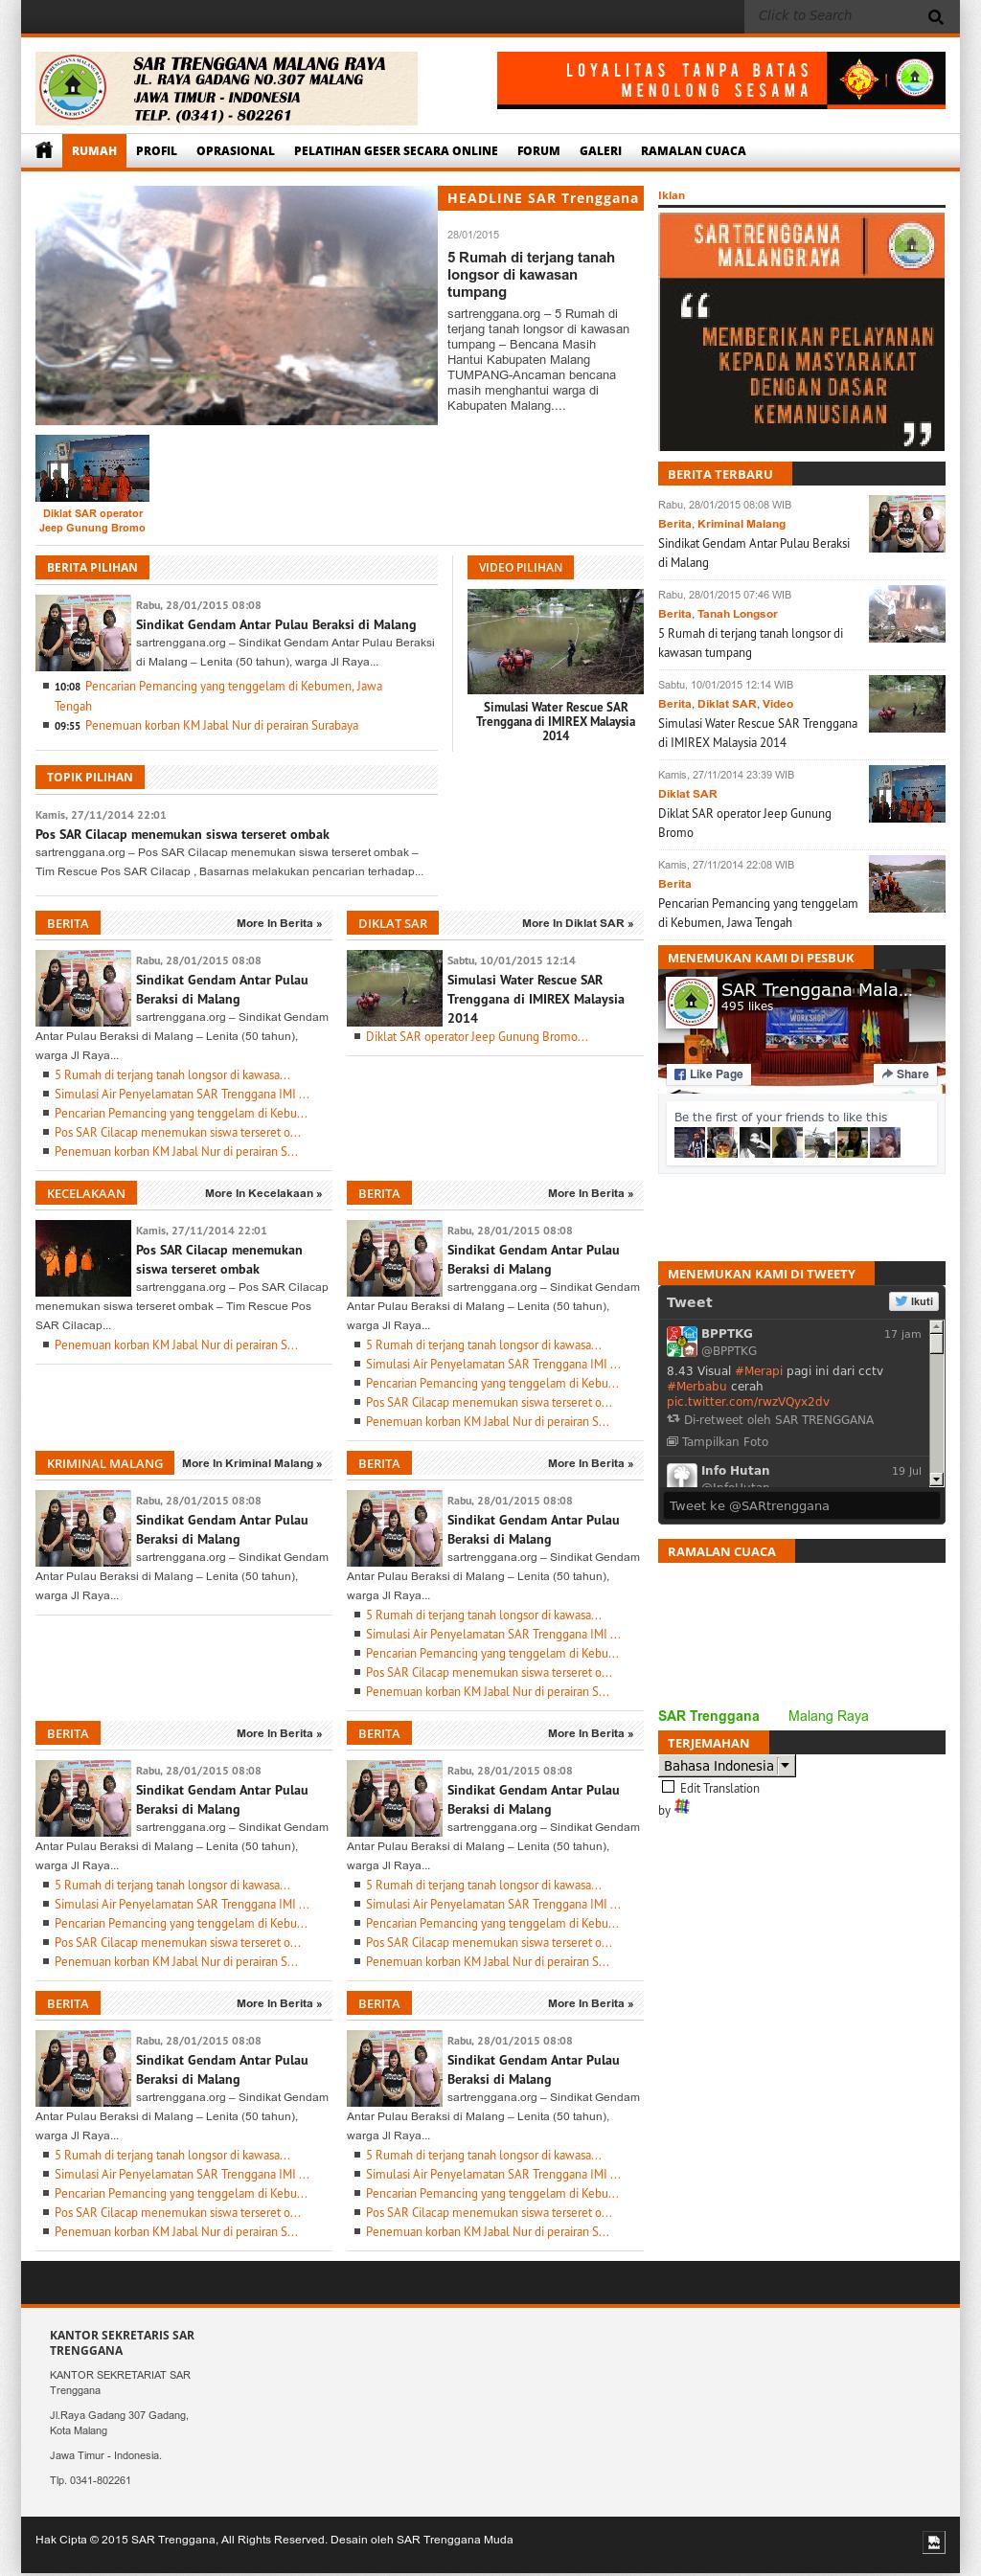 Sar Trenggana Malang Raya Competitors Revenue And Employees Owler Company Profile